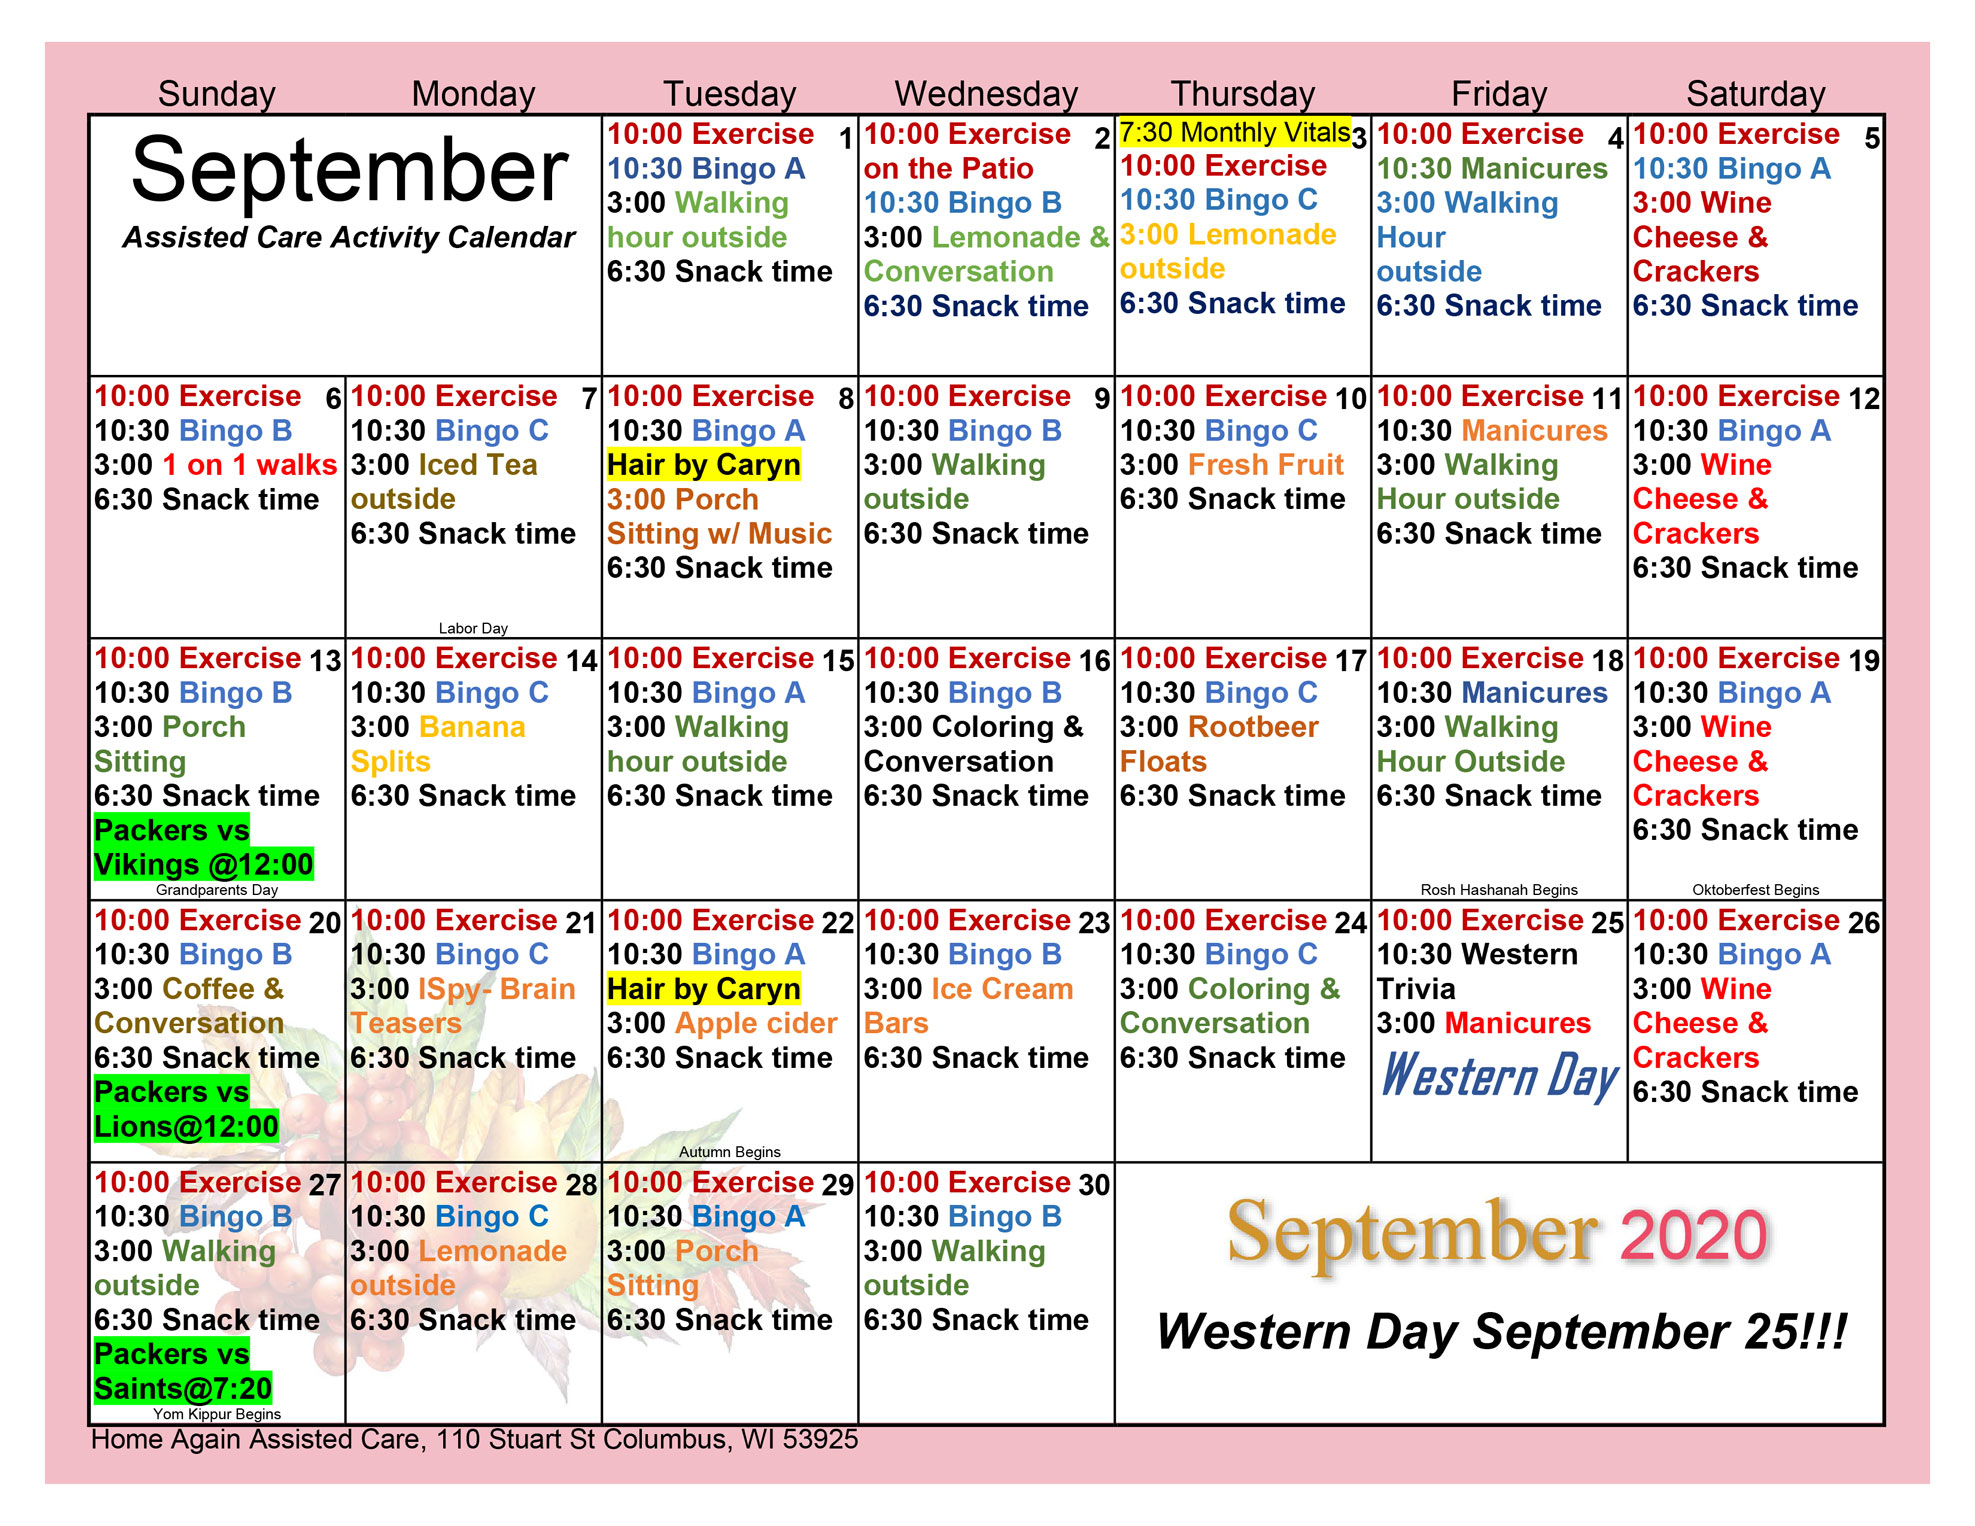 Columbus Assisted Living September 2020 Activity Calendar